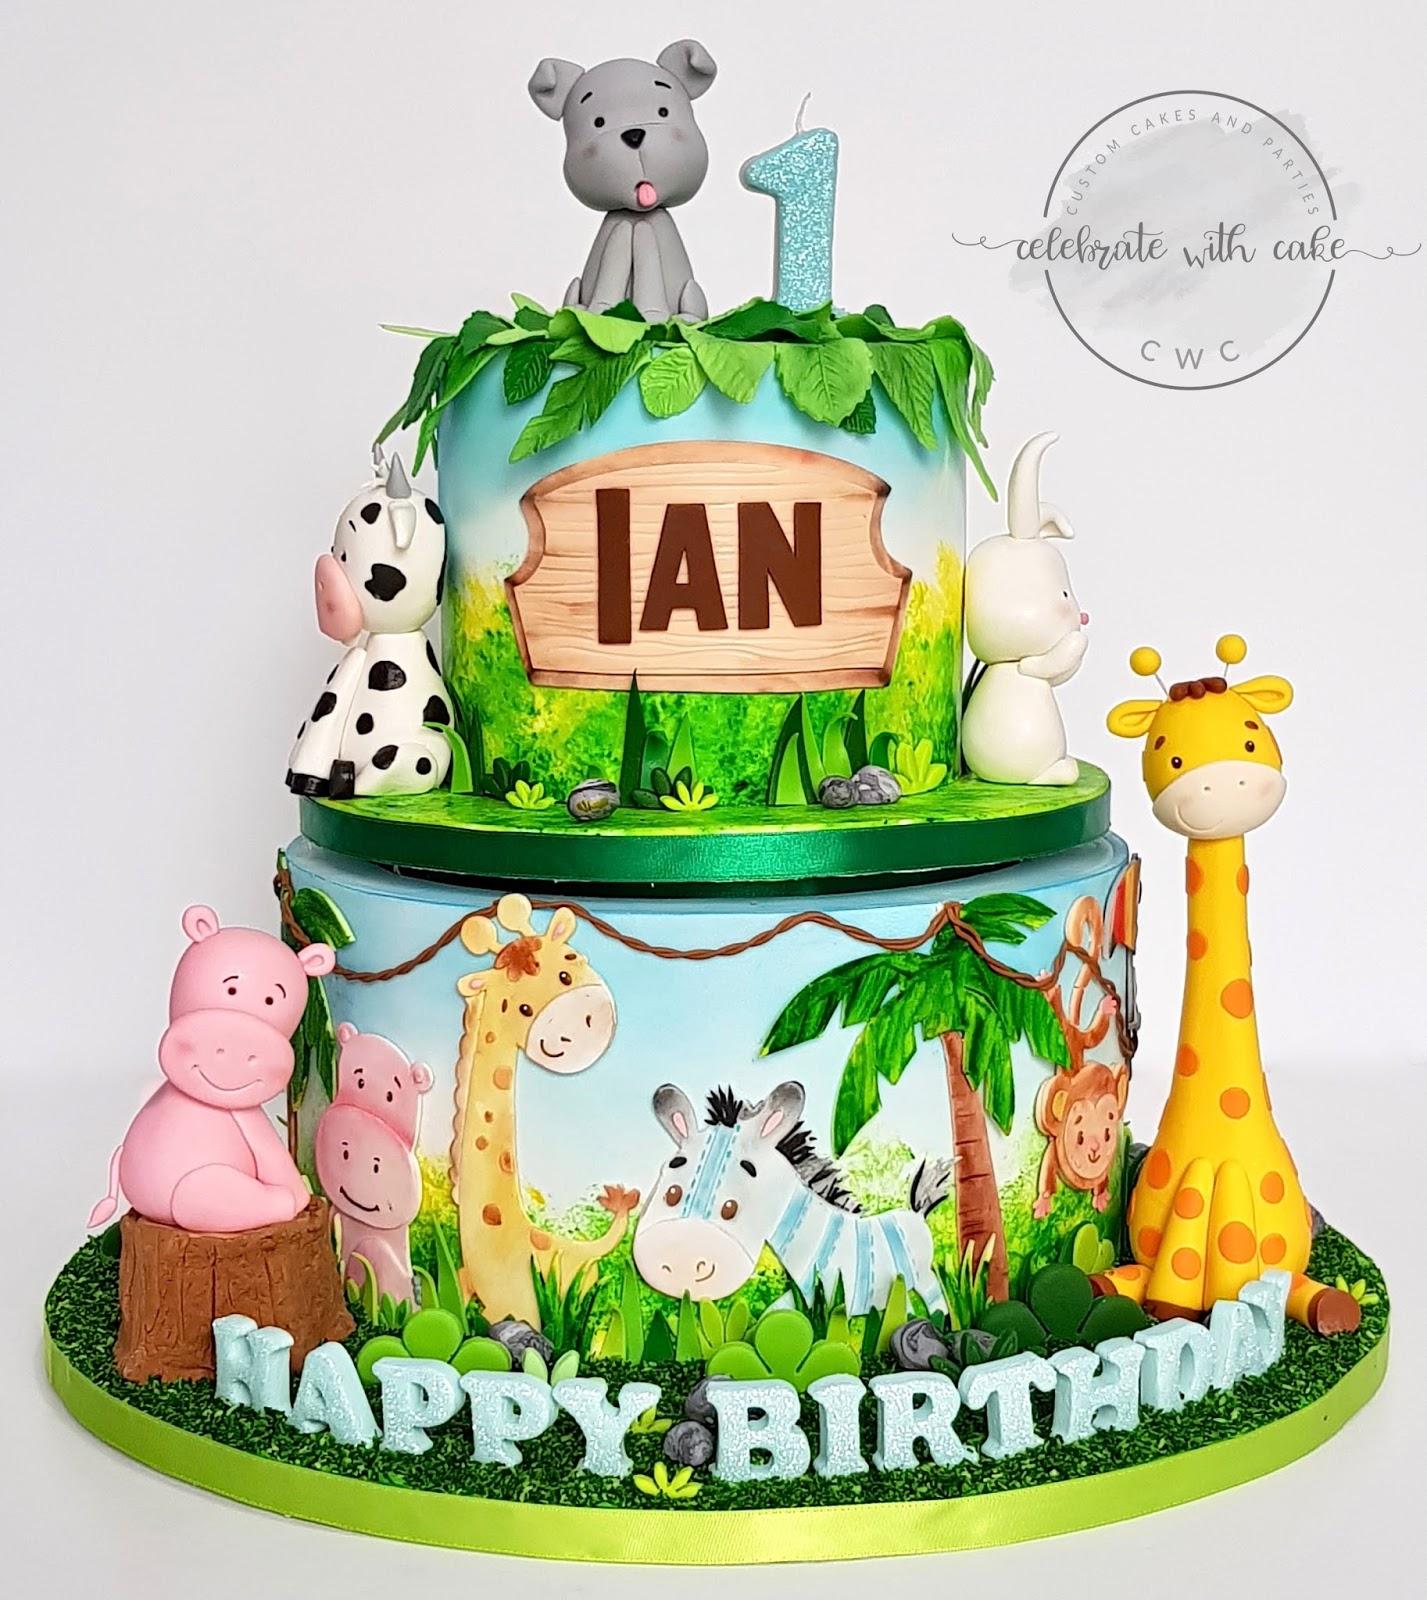 Celebrate With Cake Safari Themed Rotating Cake 1st Birthday